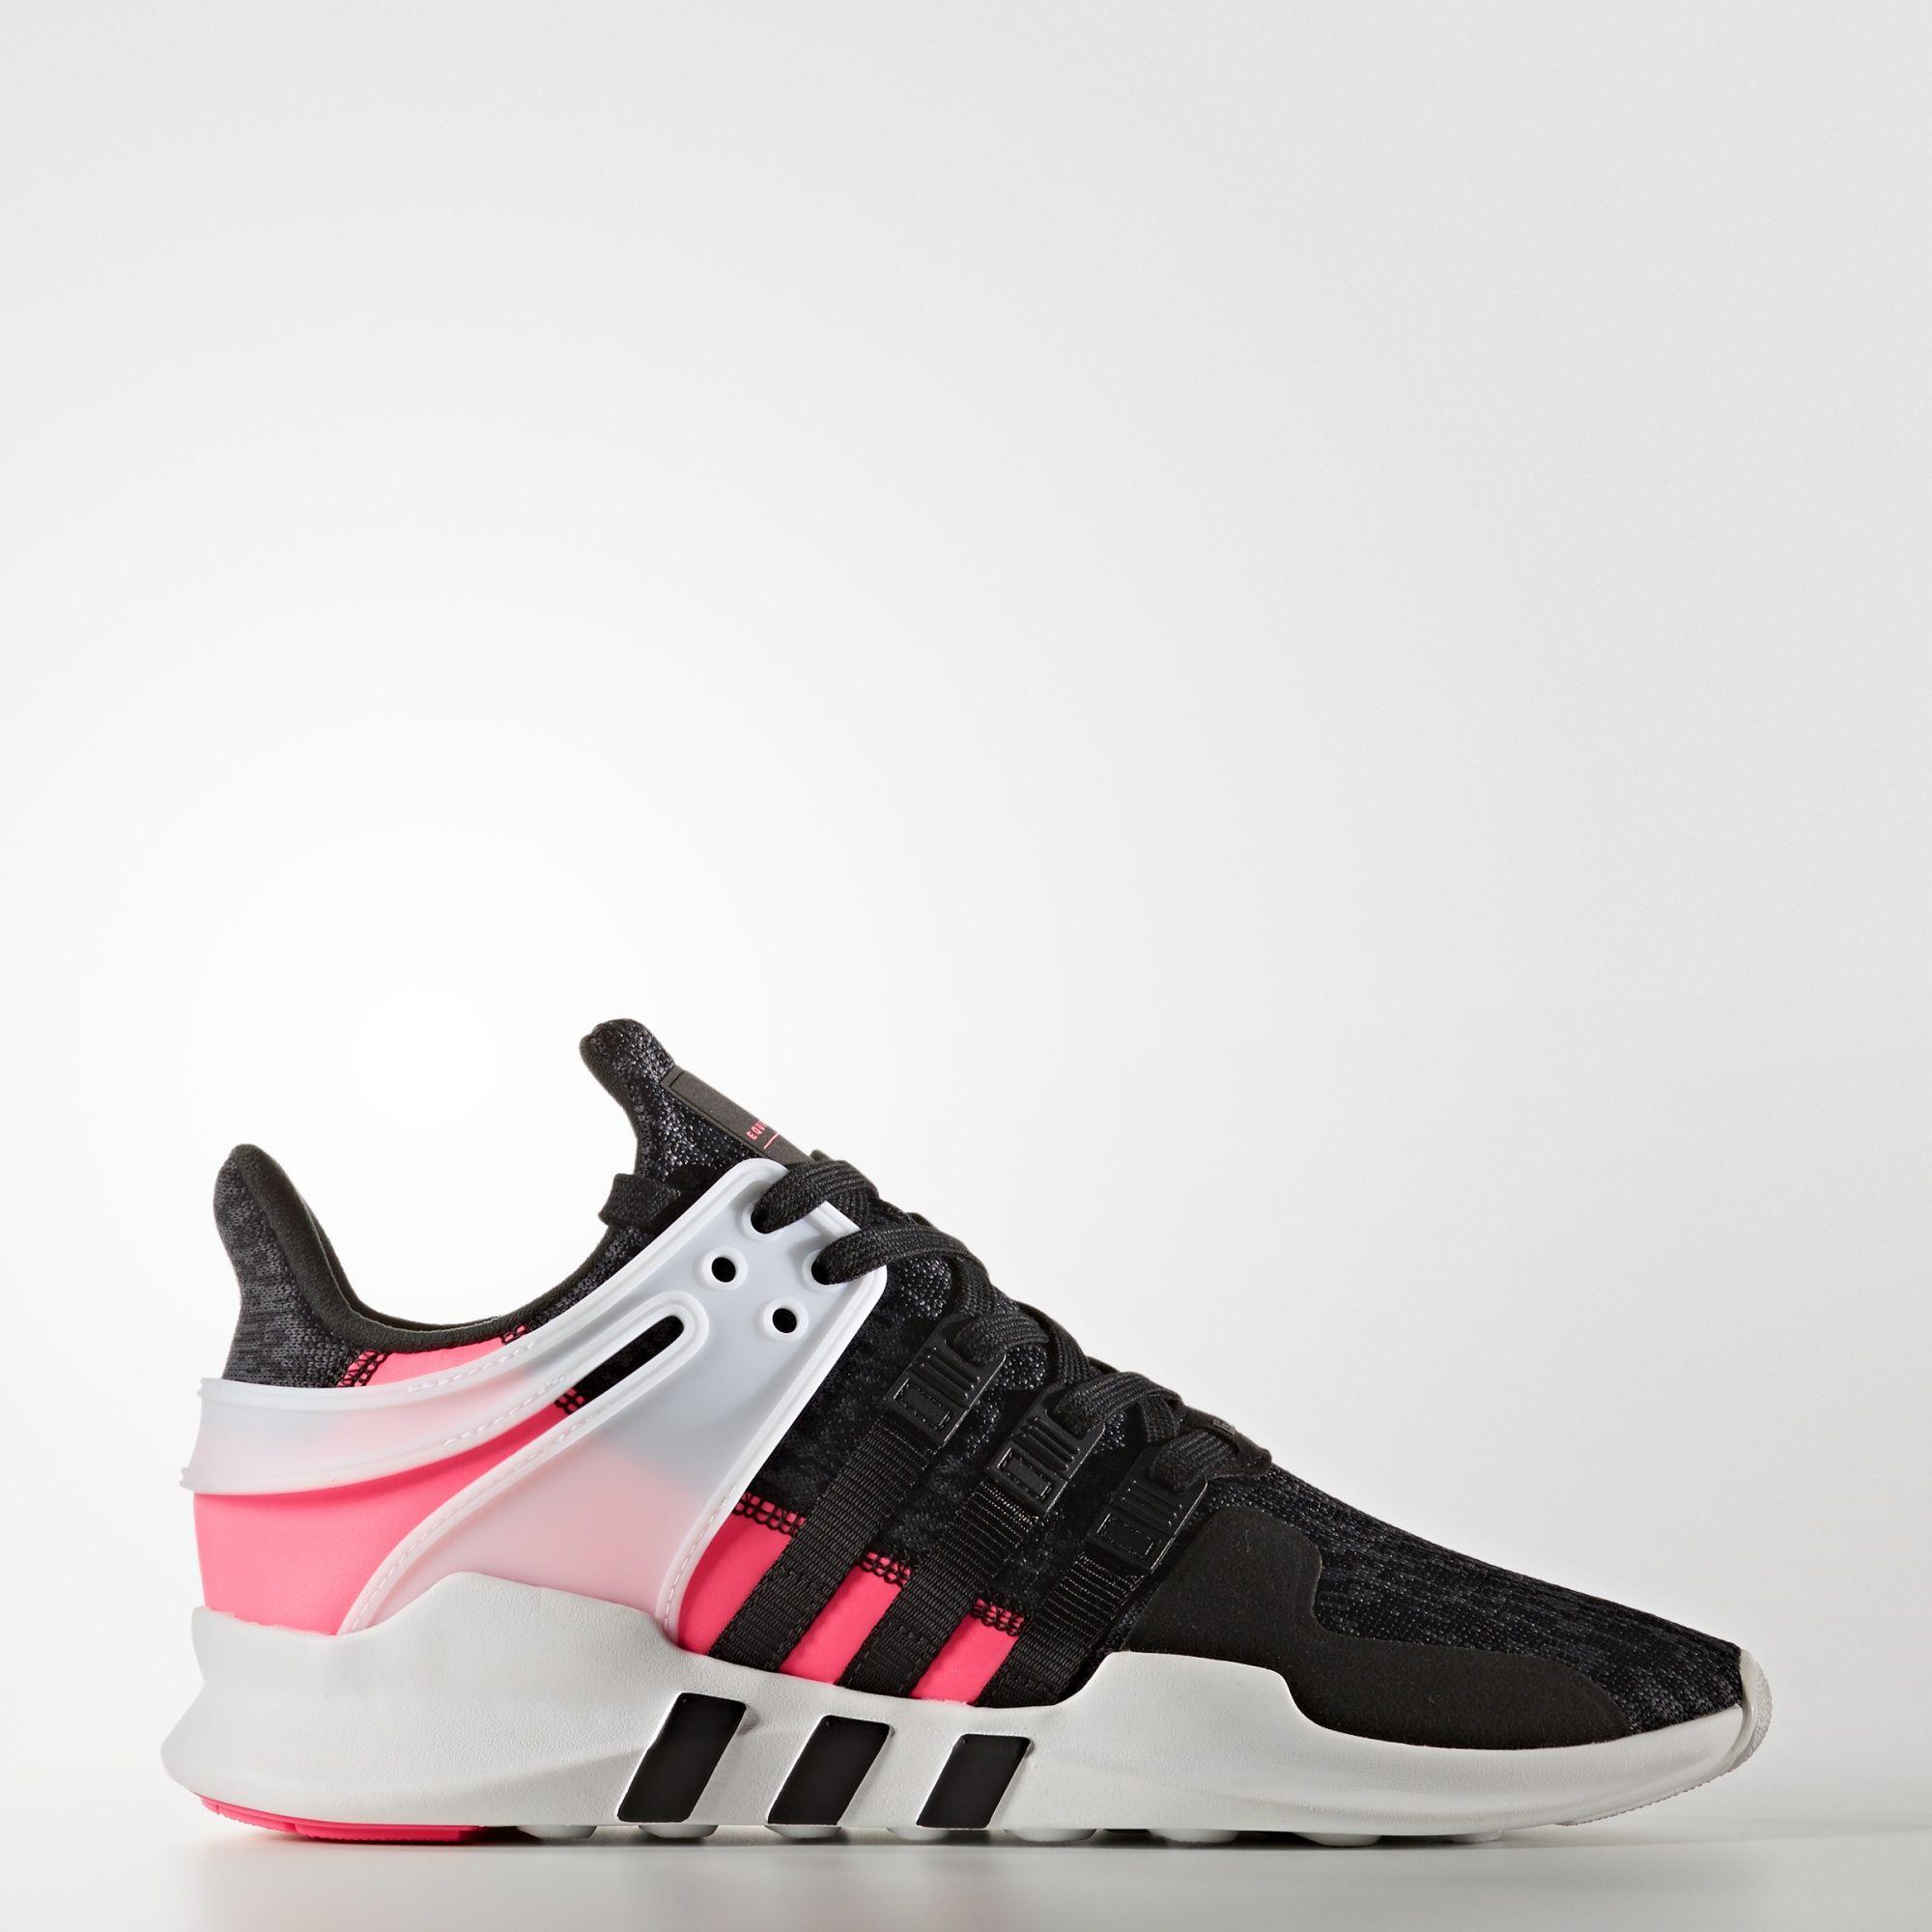 Adidas Eqt Turbo Pink